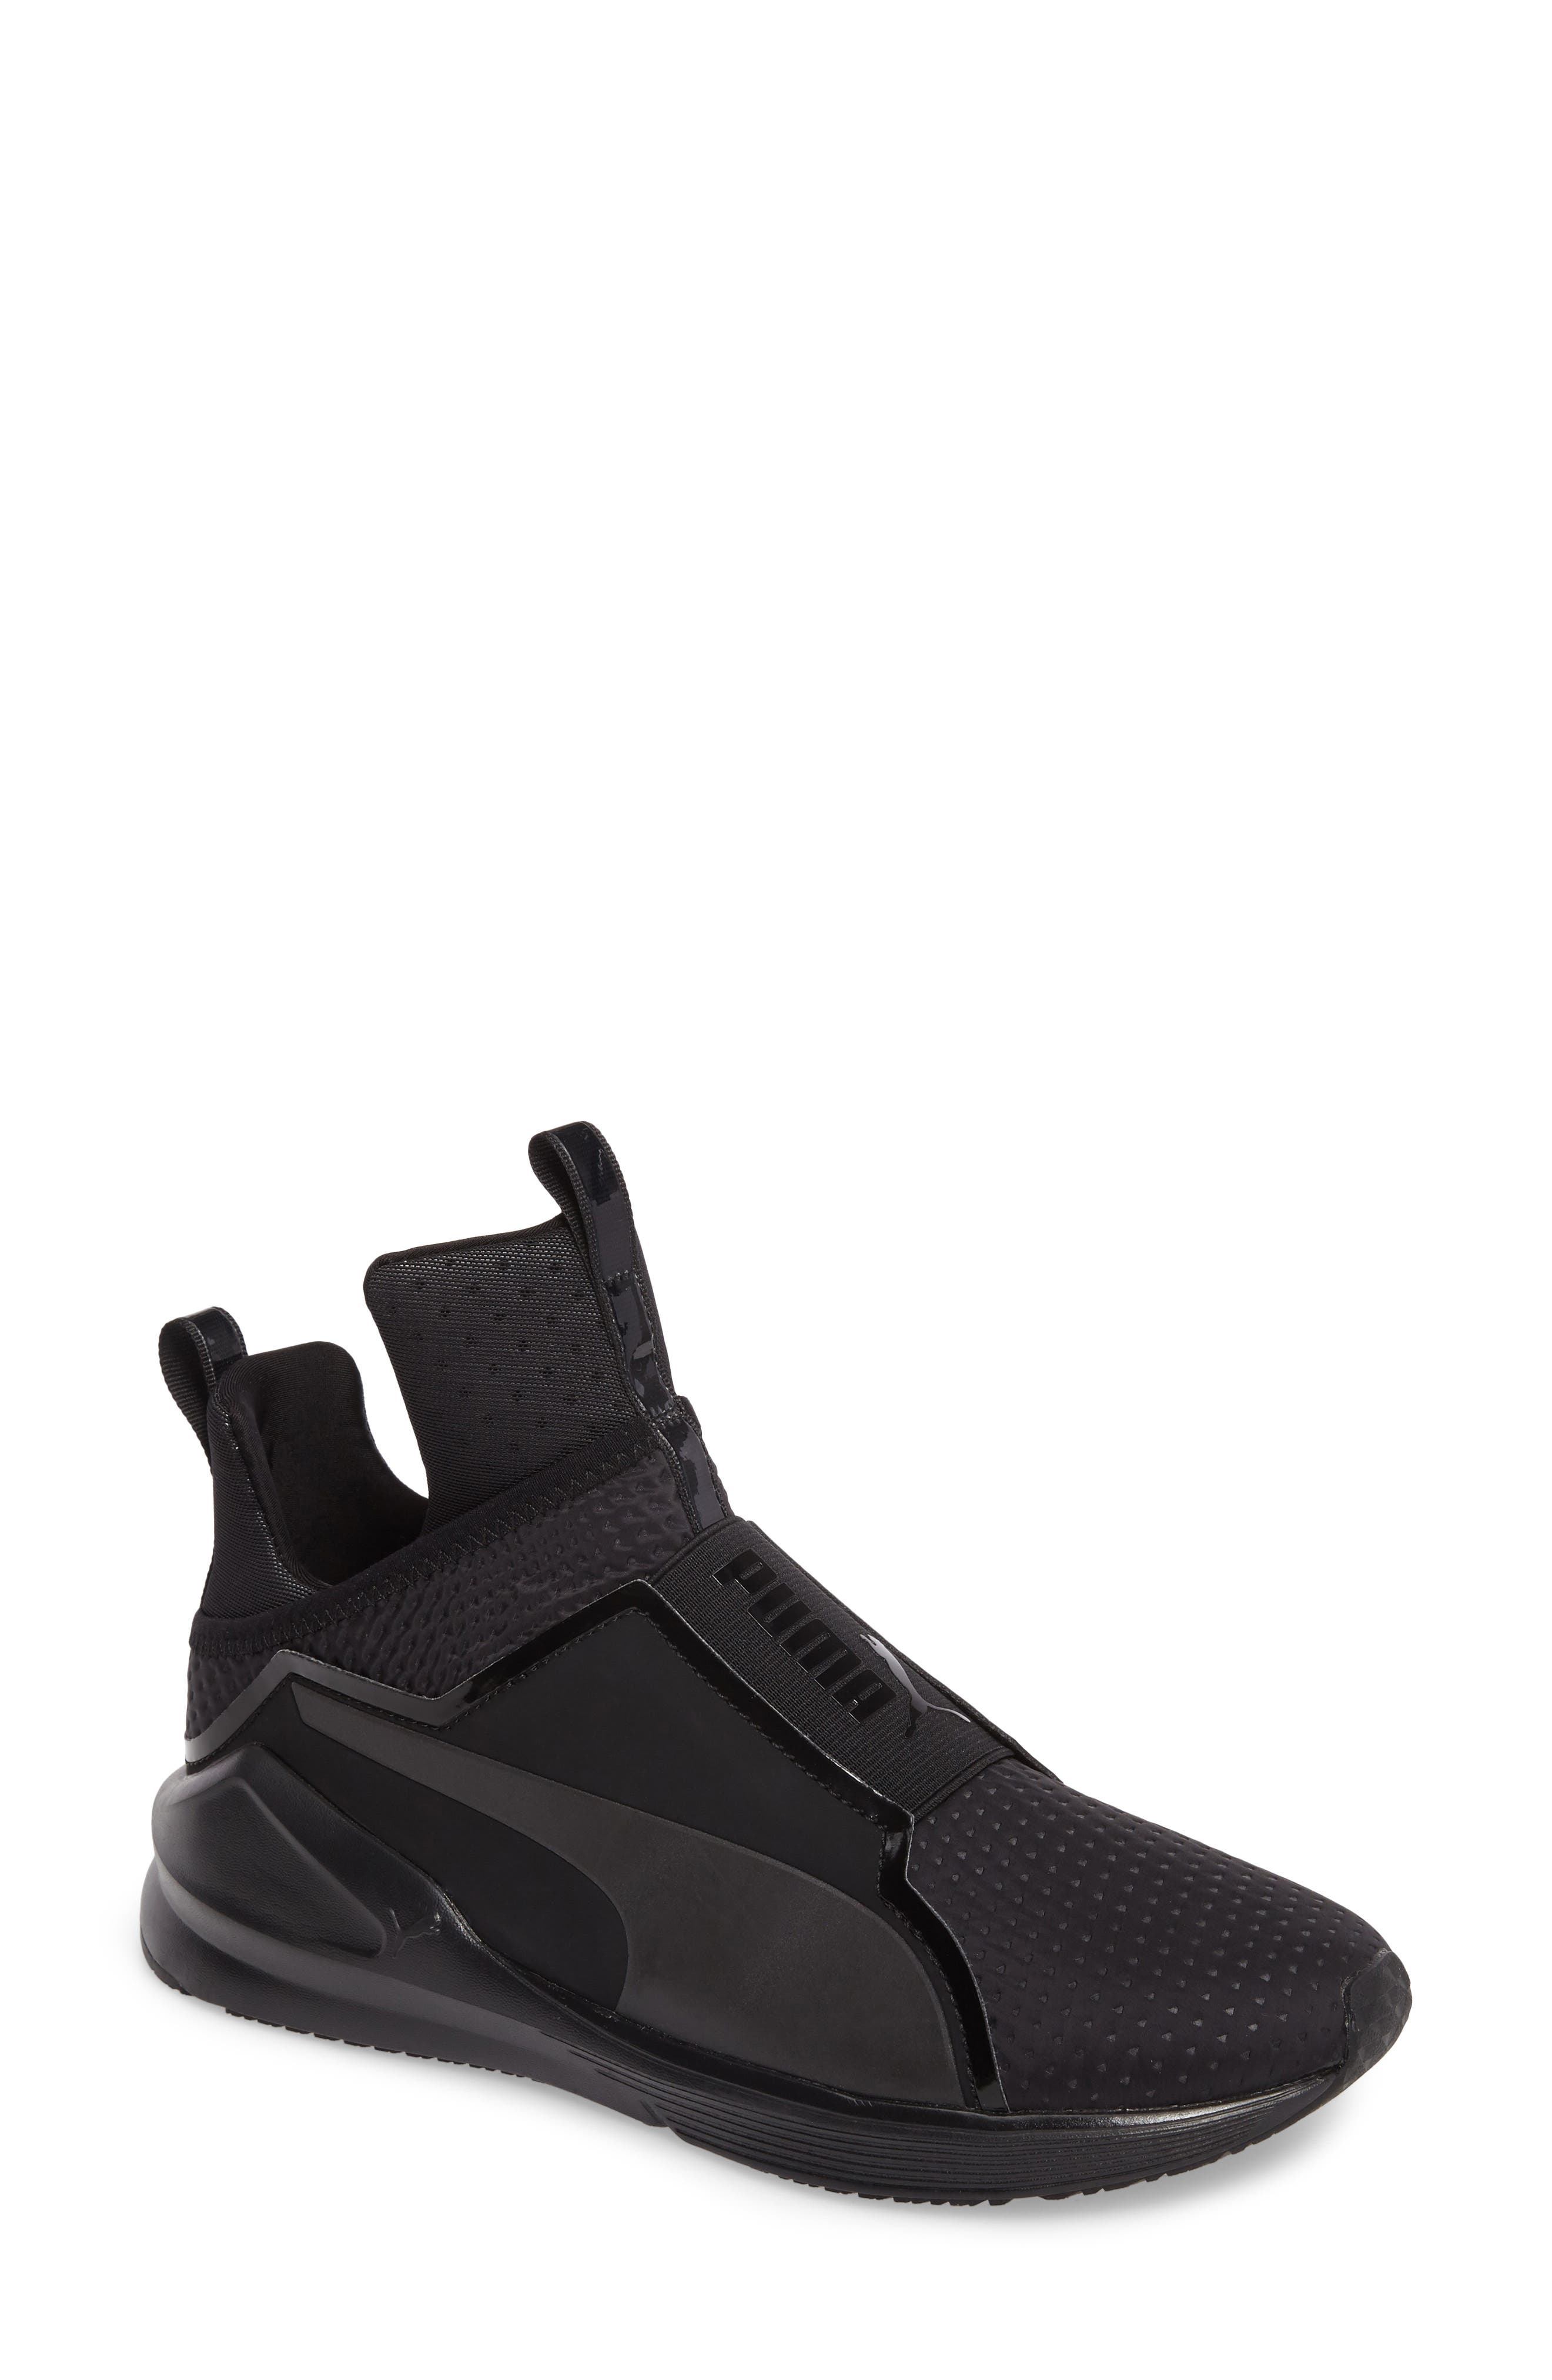 'Fierce Core' High Top Sneaker,                         Main,                         color, Onyx Black